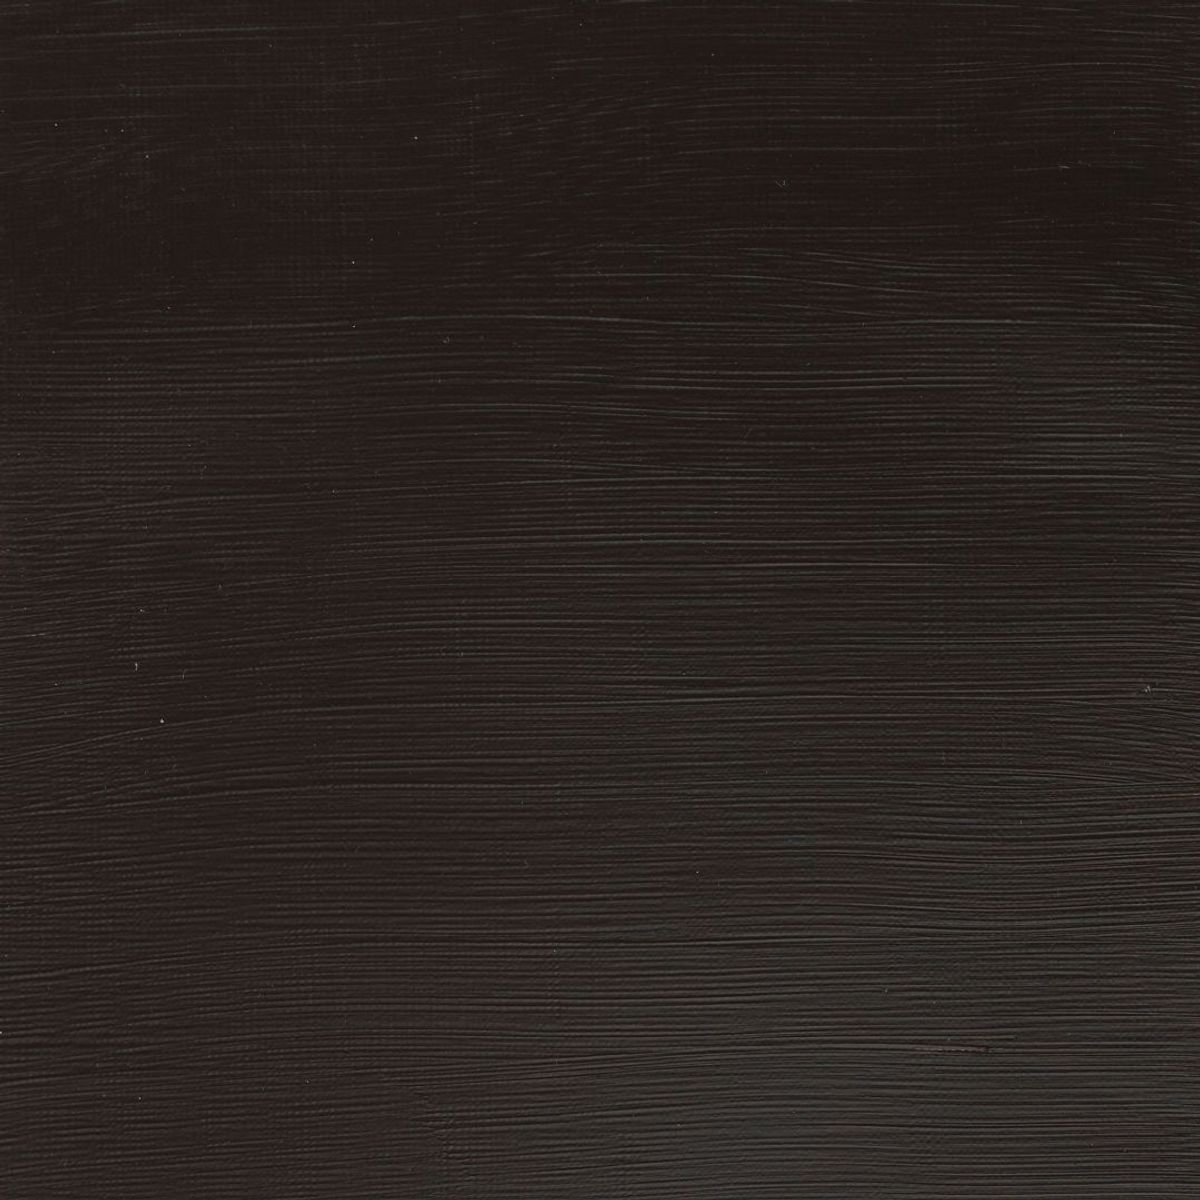 WINSOR AND NEWTON GALERIA ACRYLIC COLOUR - TUBE OF 60 ML - VANDYKE BROWN (676)